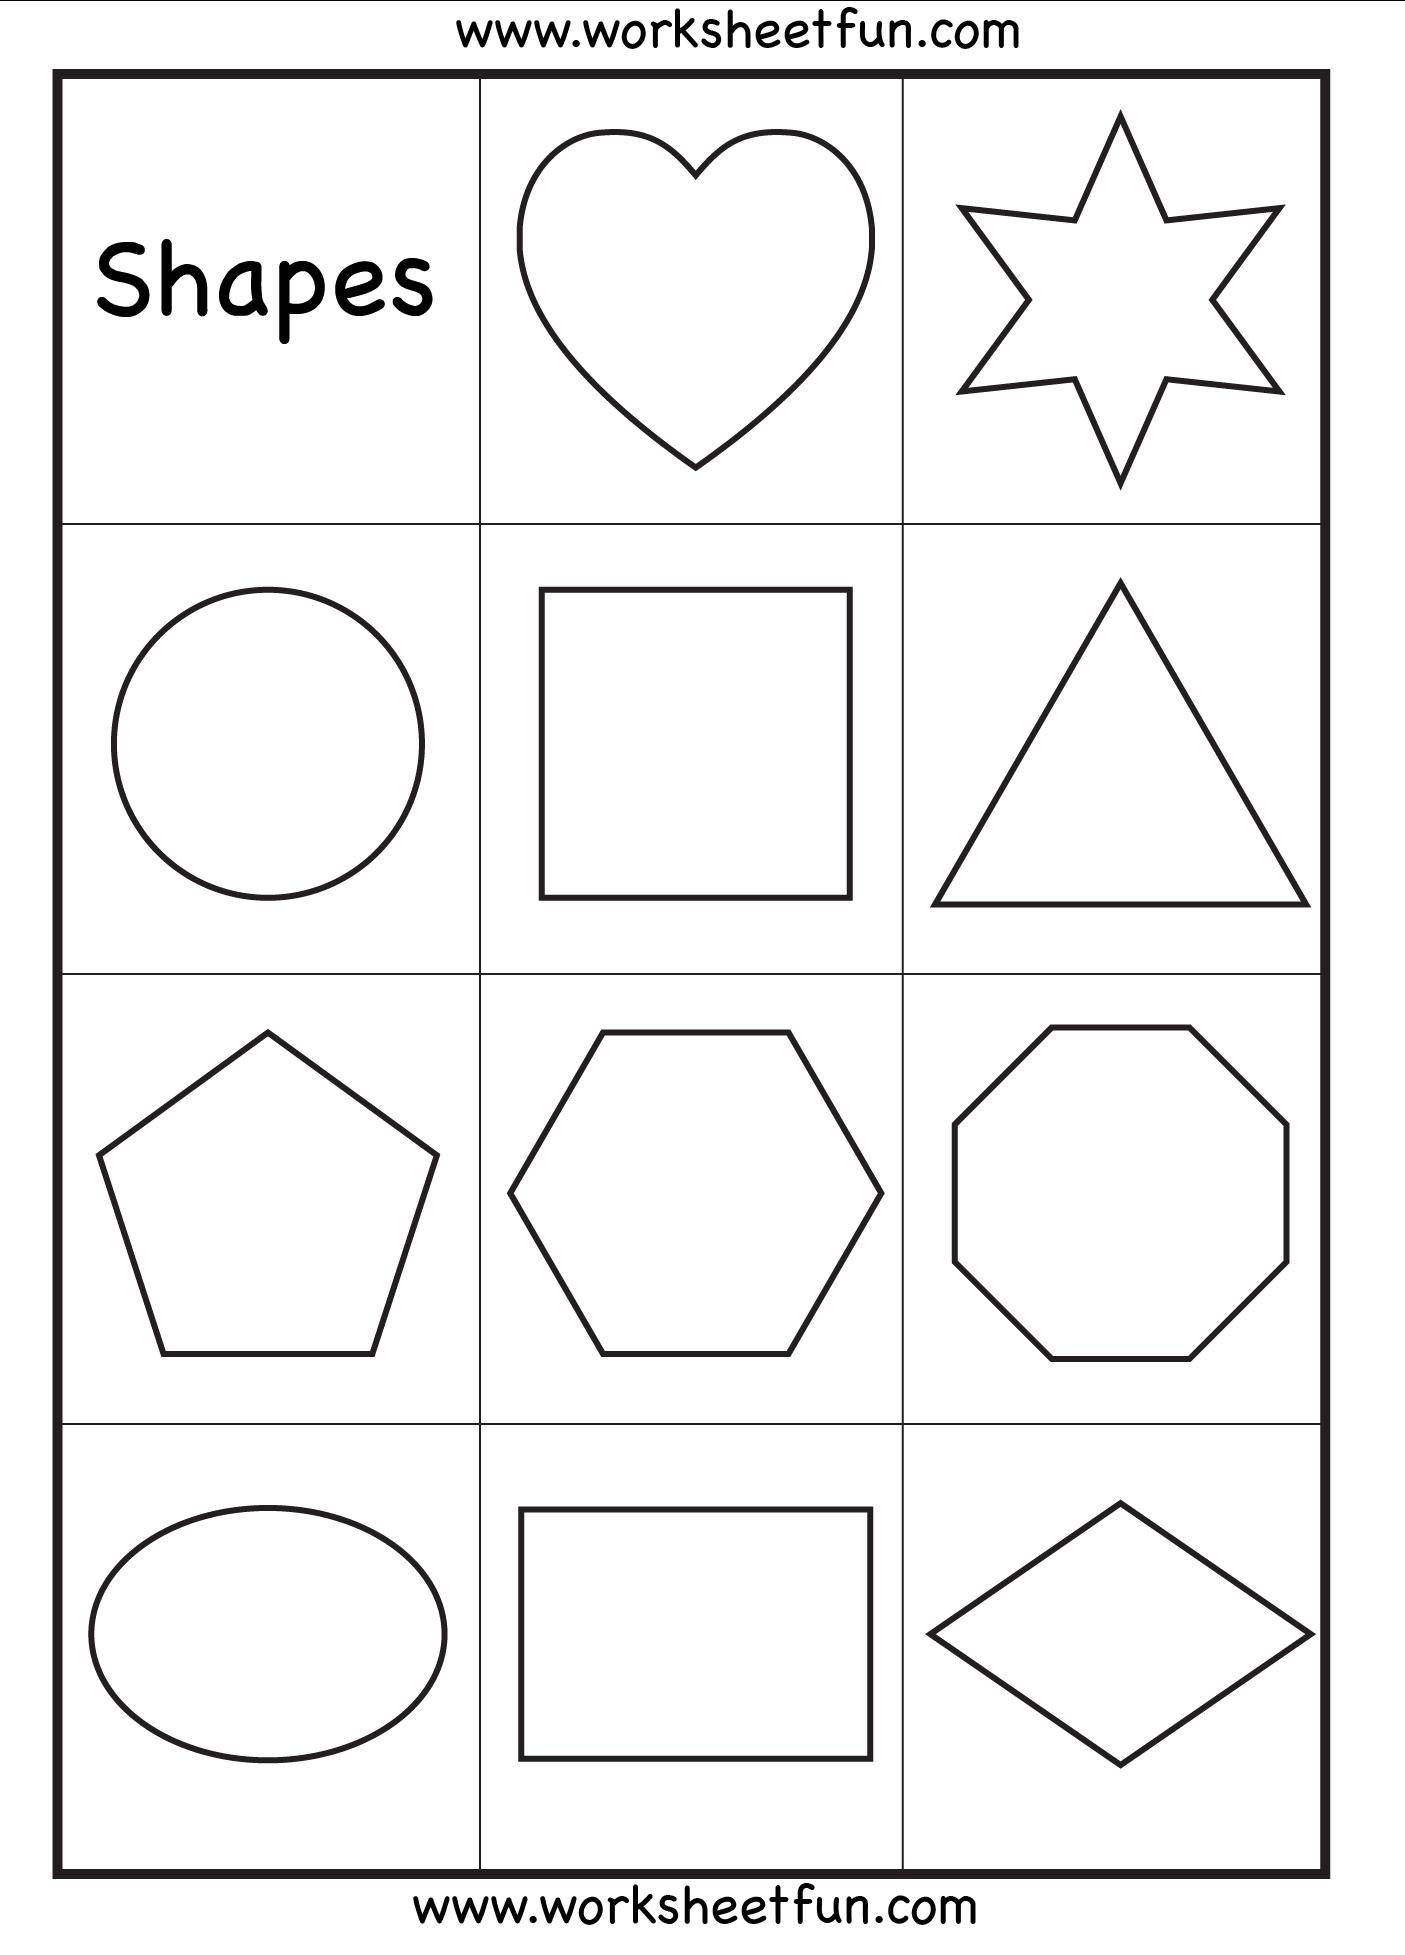 Staggering Oval Shape Worksheets For Preschool – Lbwomen